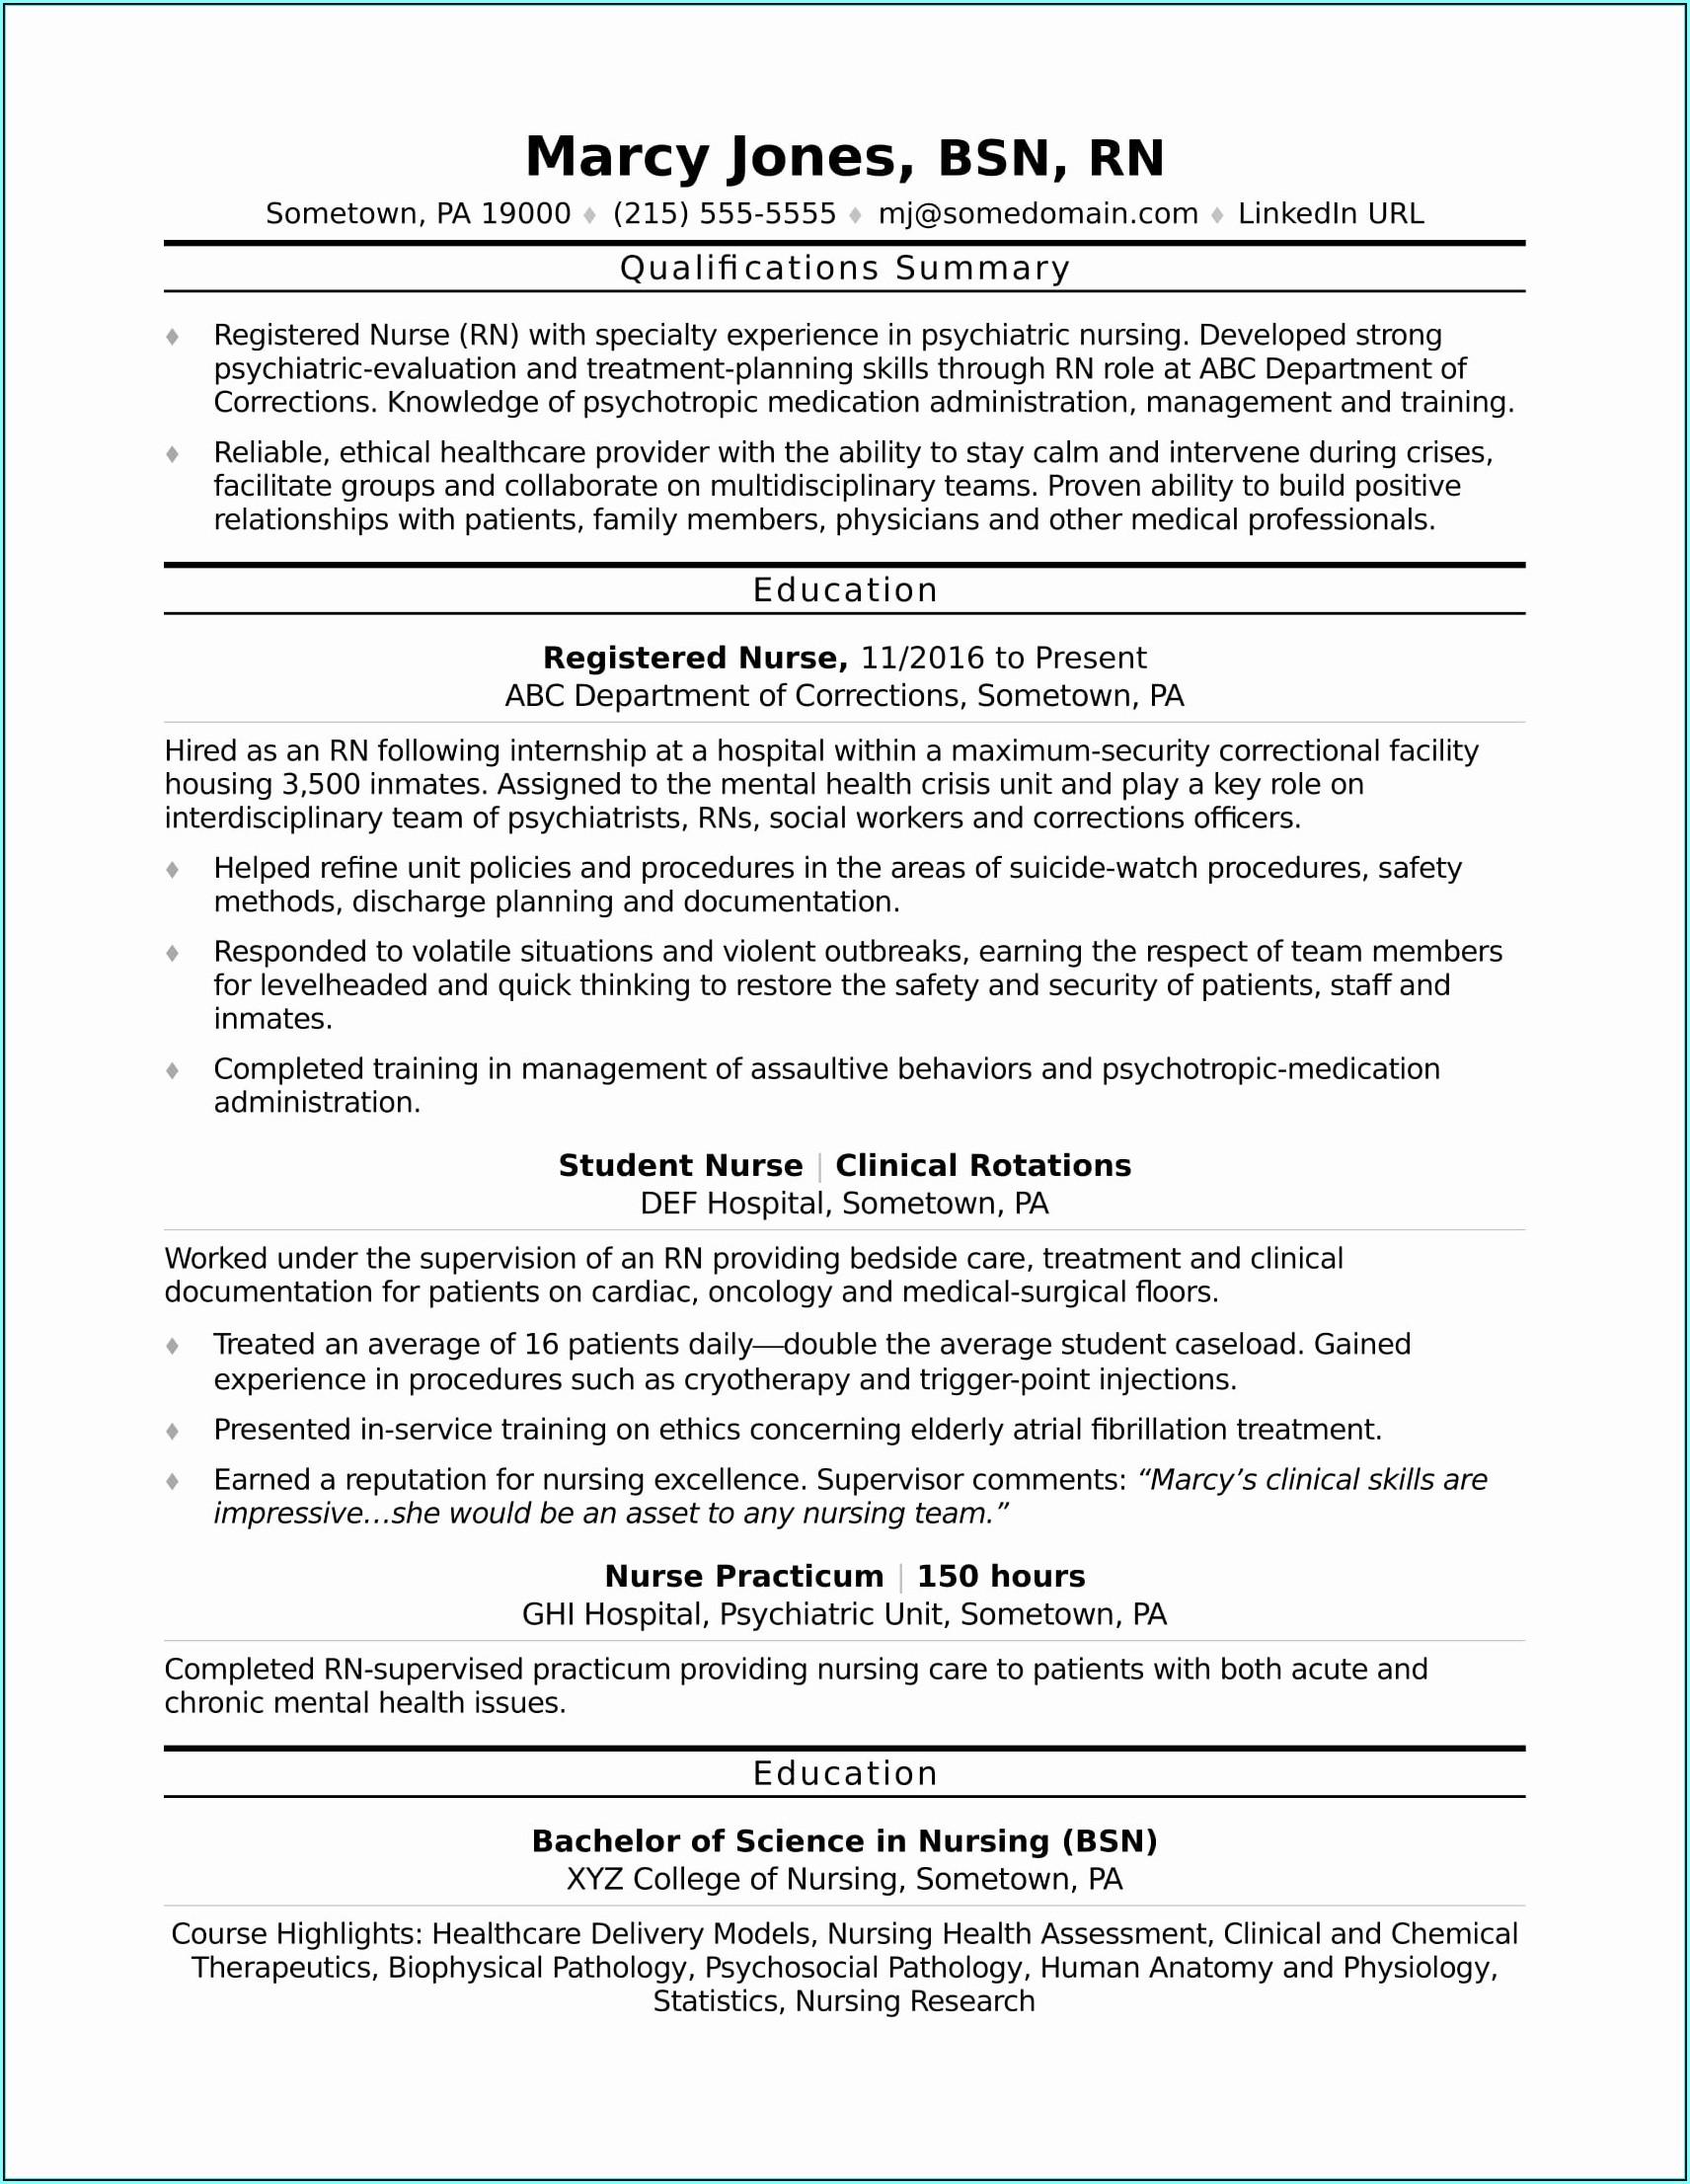 Resume Template For Nursing School Application